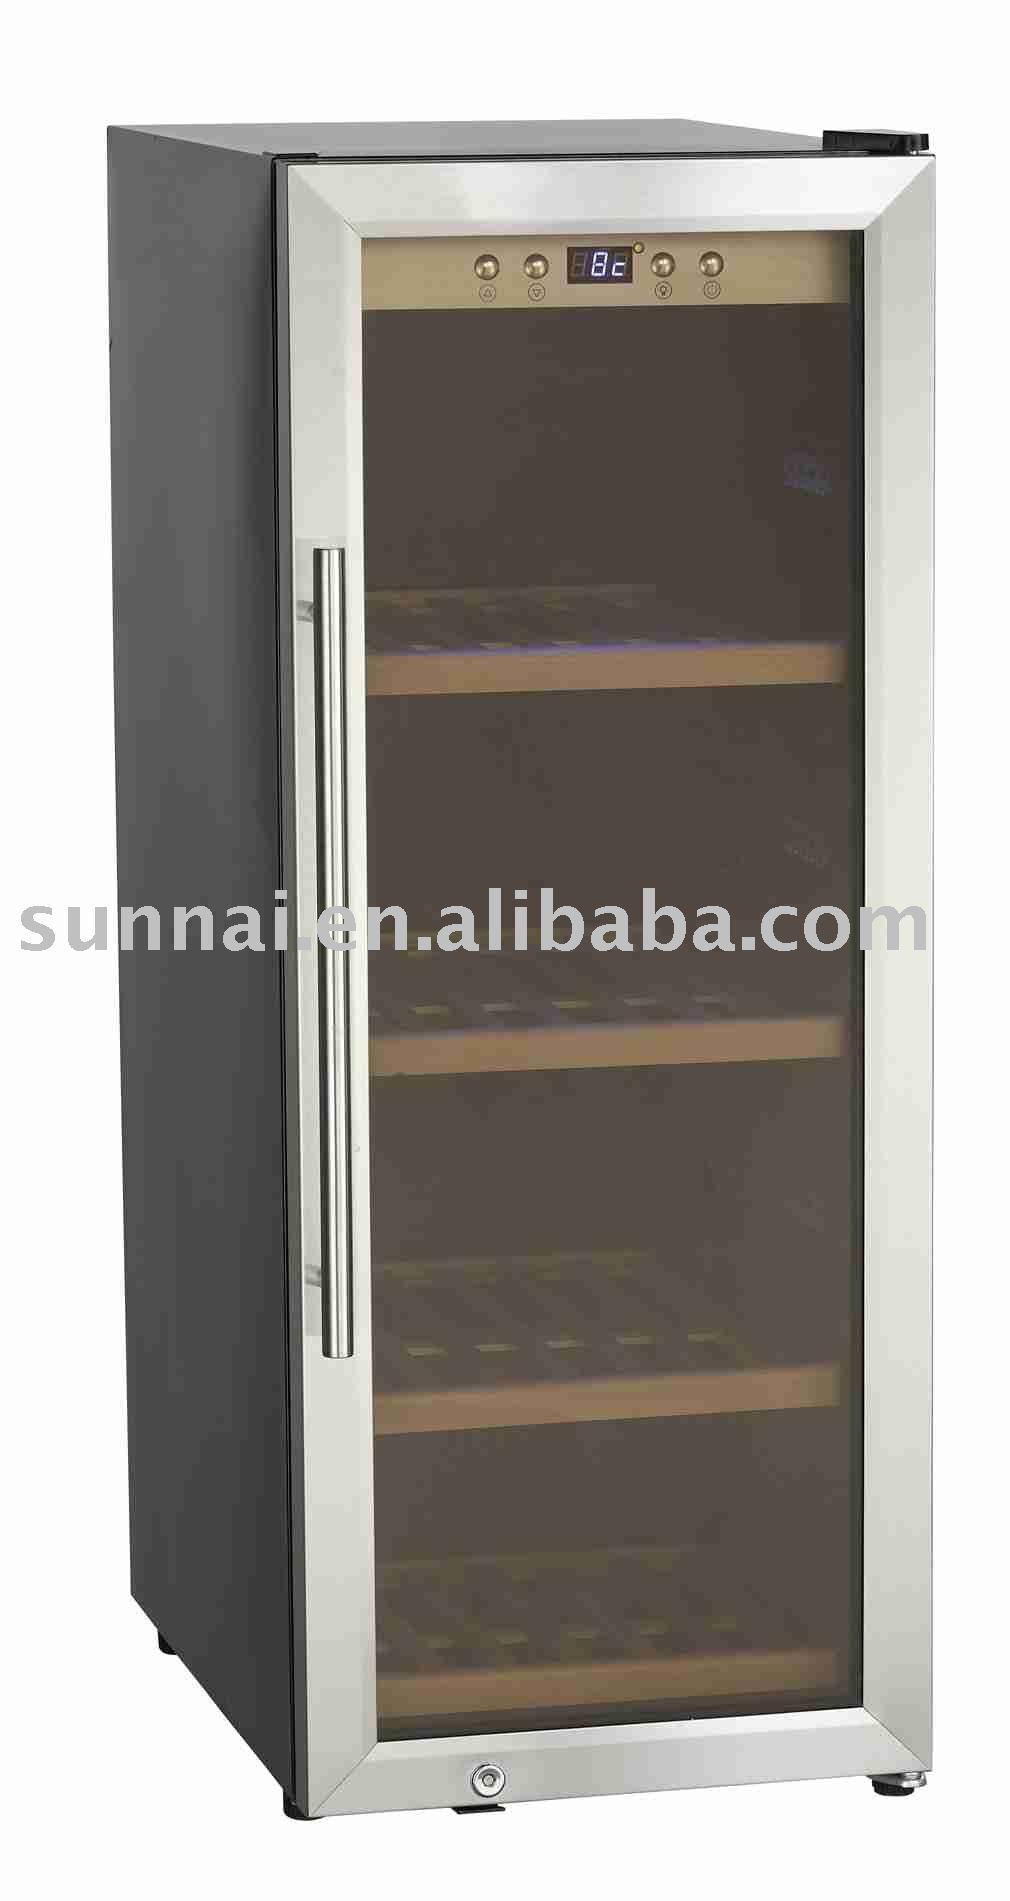 Glass door mini bar fridge glass door mini bar fridge suppliers and glass door mini bar fridge glass door mini bar fridge suppliers and manufacturers at alibaba planetlyrics Images